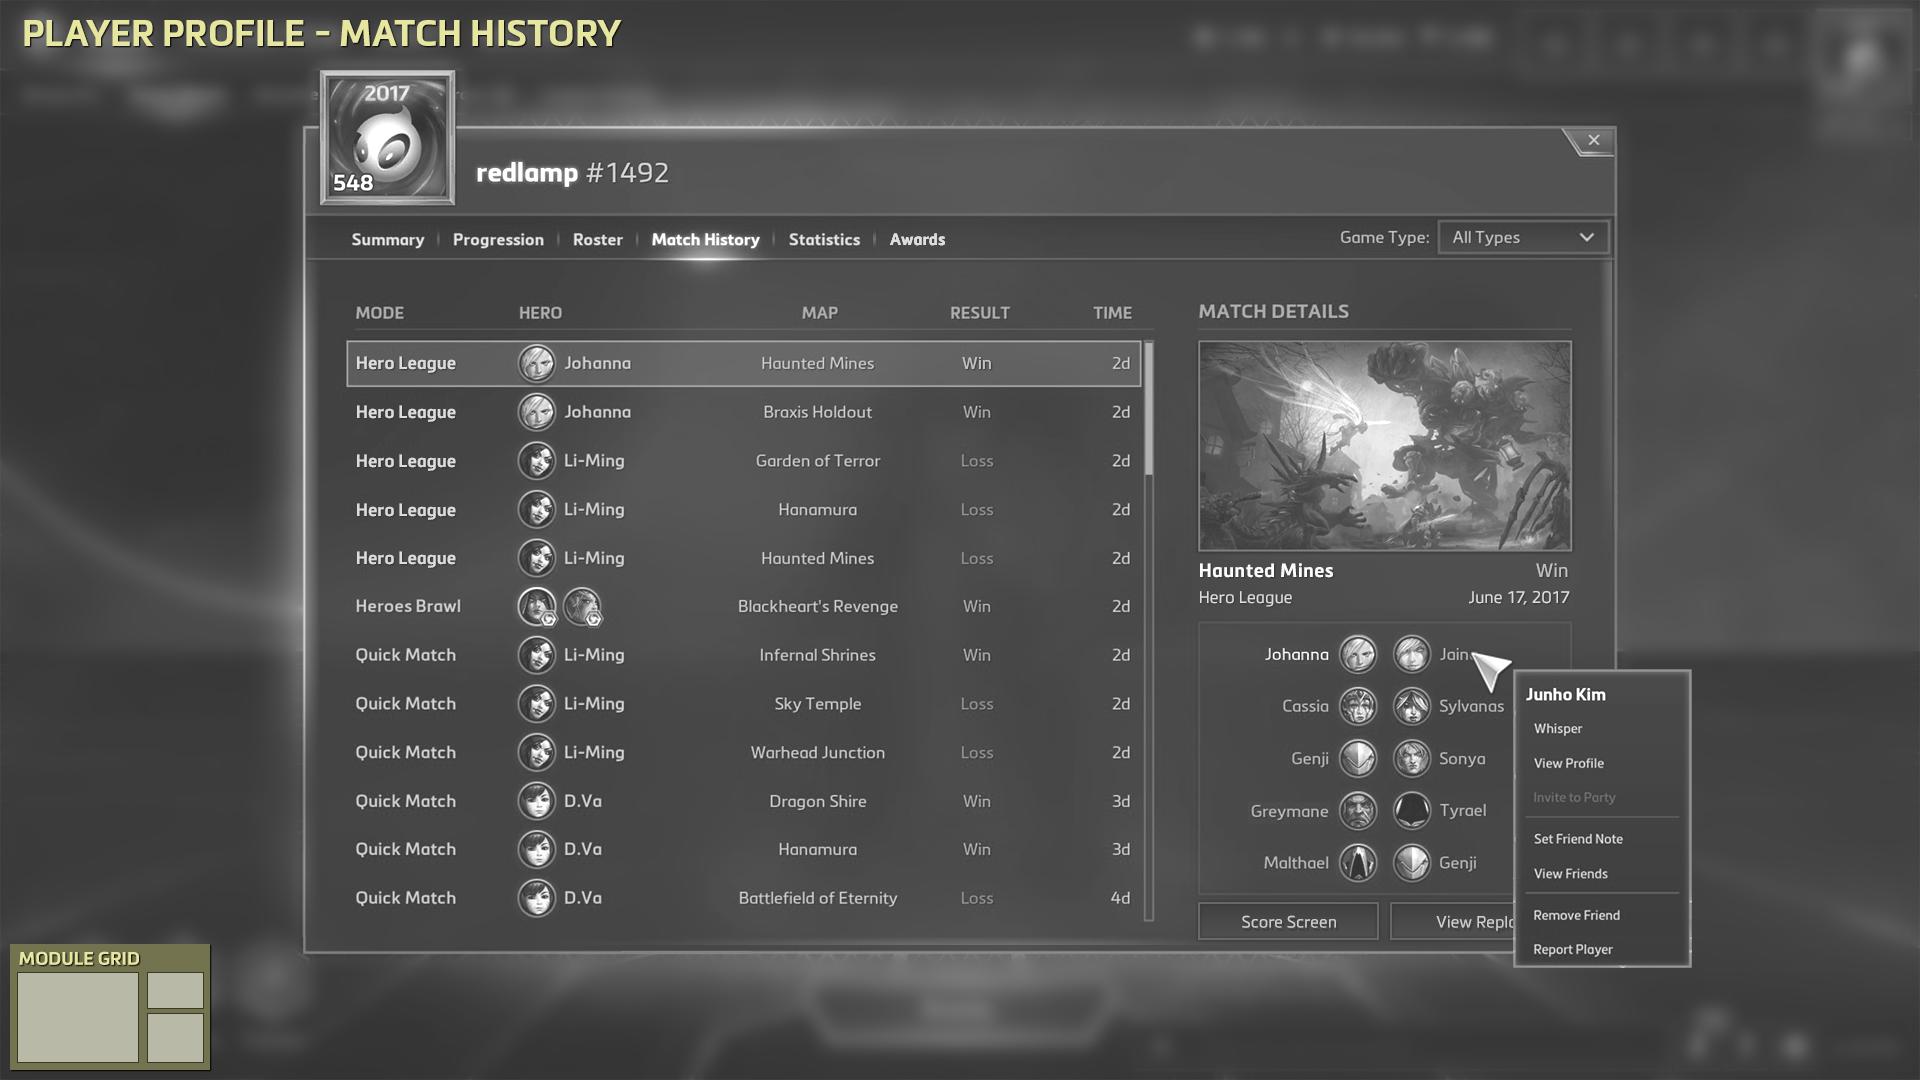 Player Profile - Match History